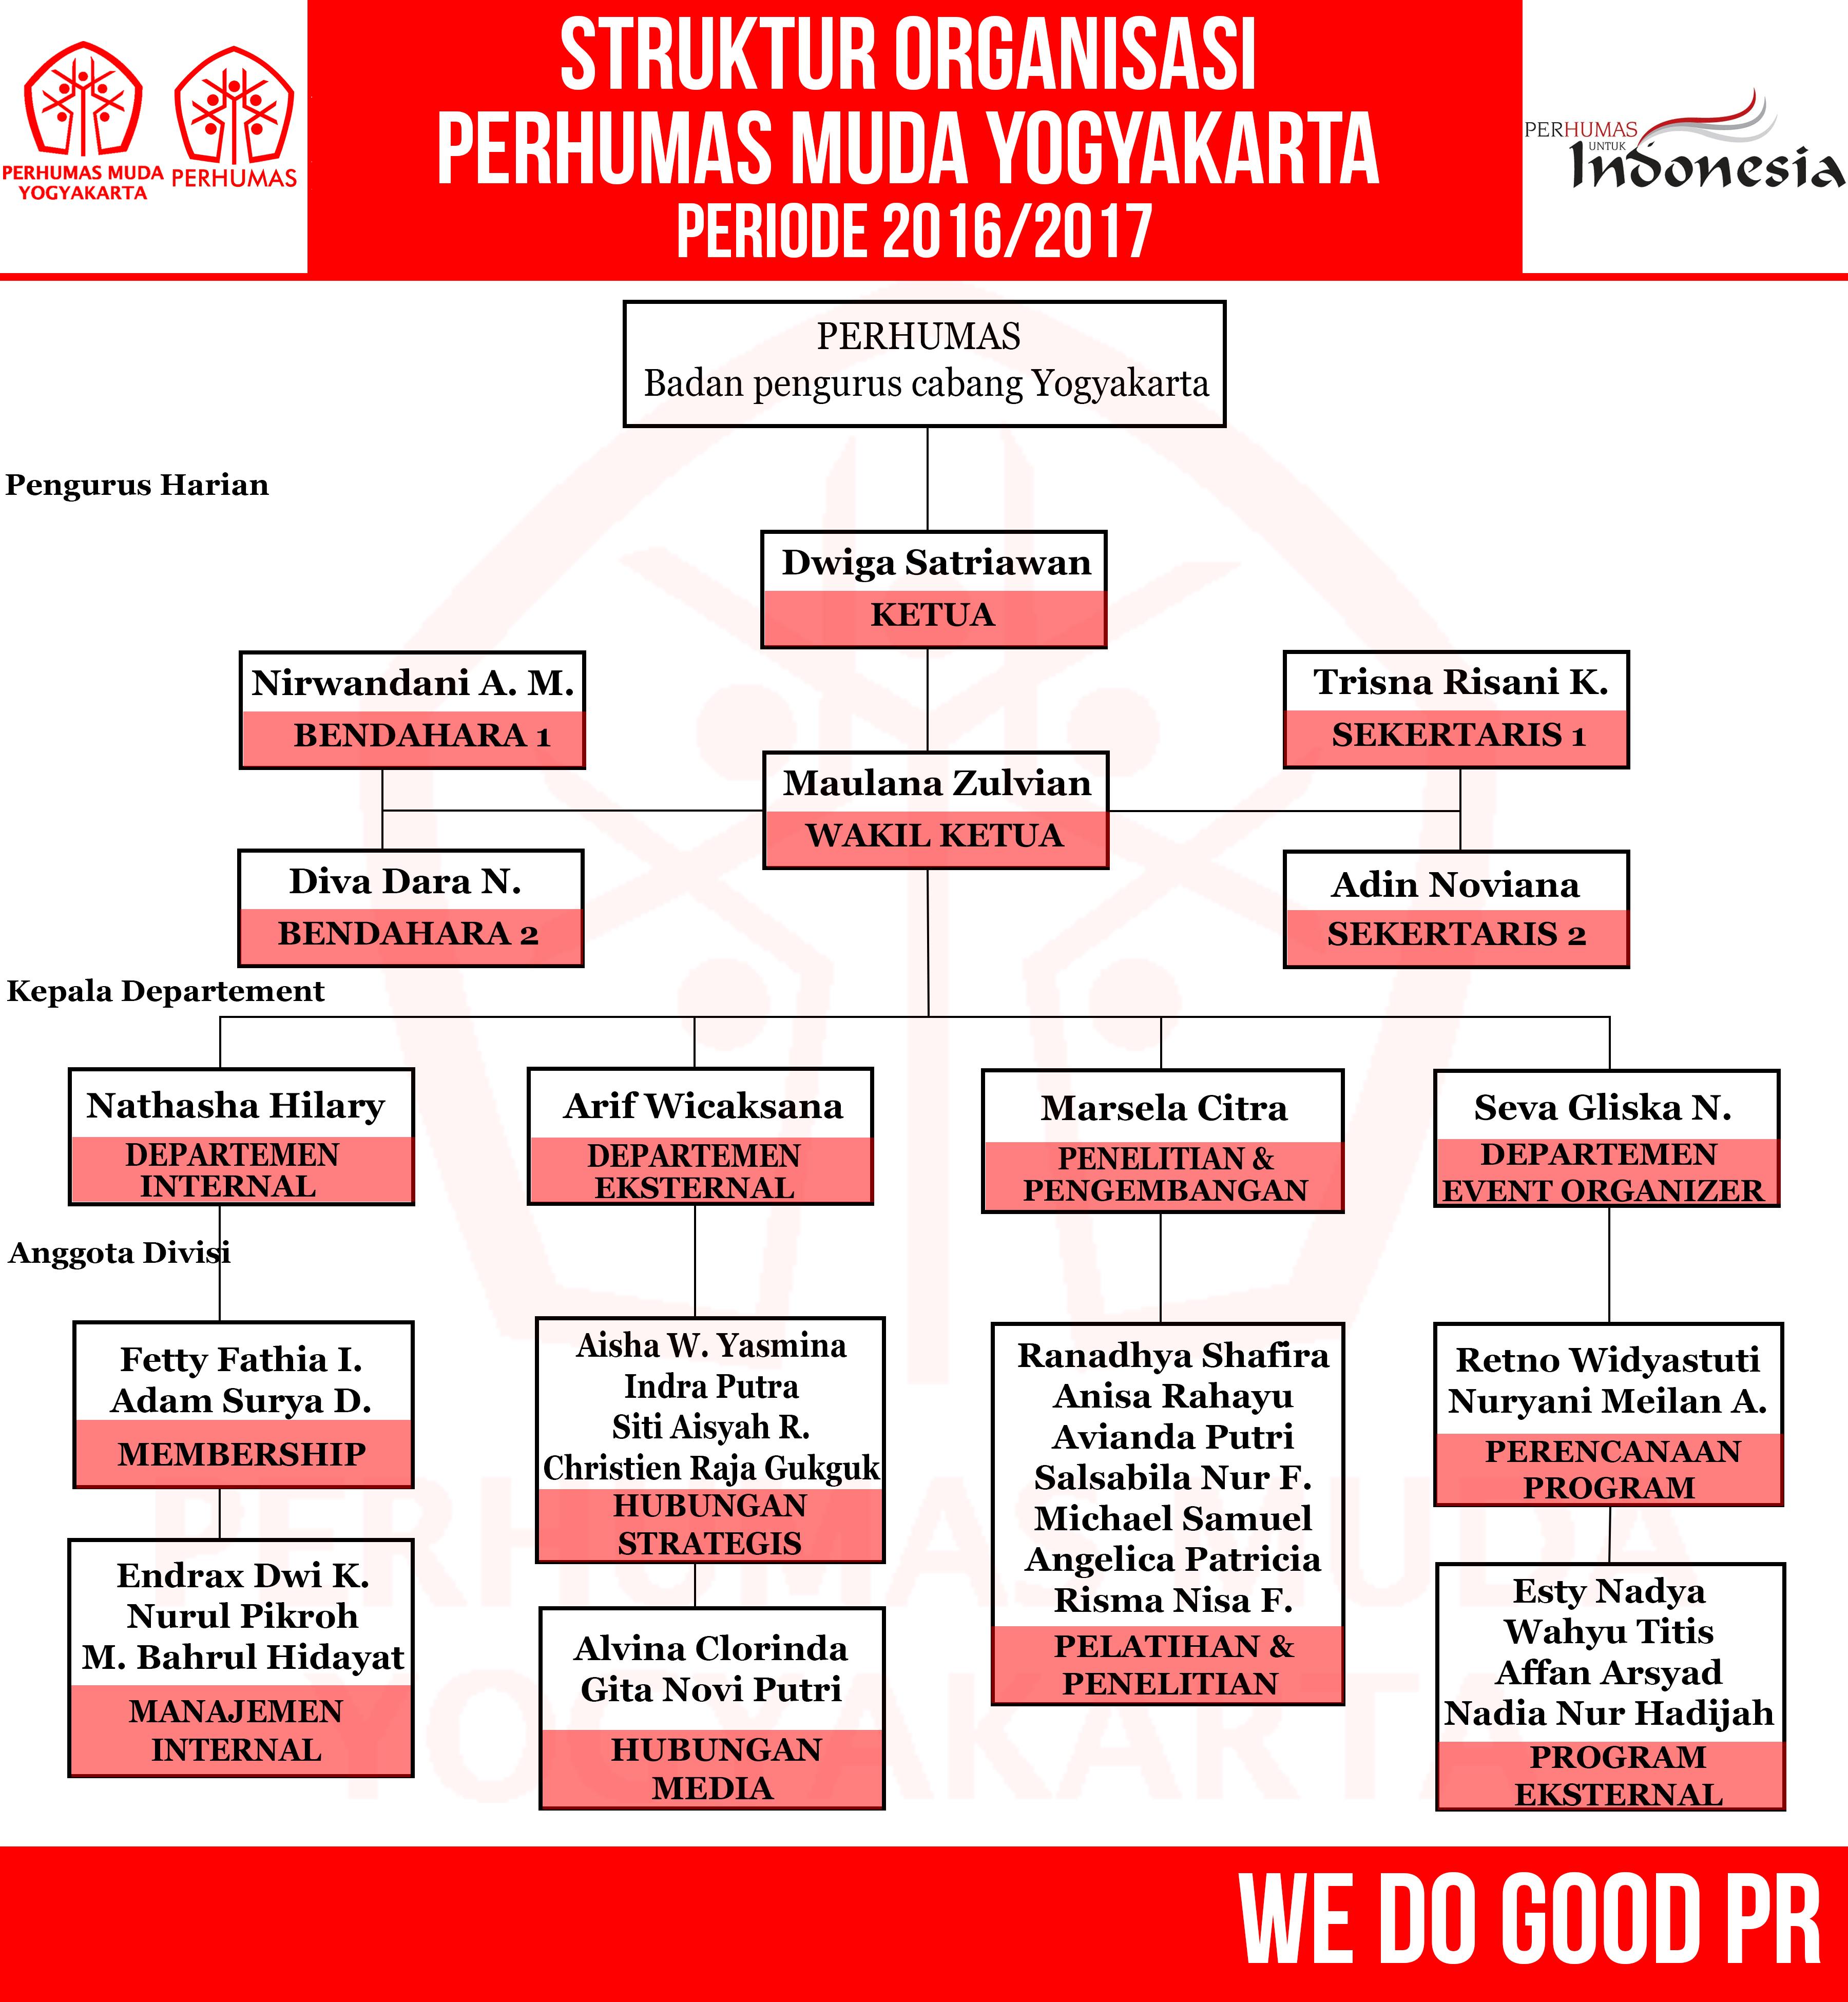 Perhumas Muda - Yogyakarta